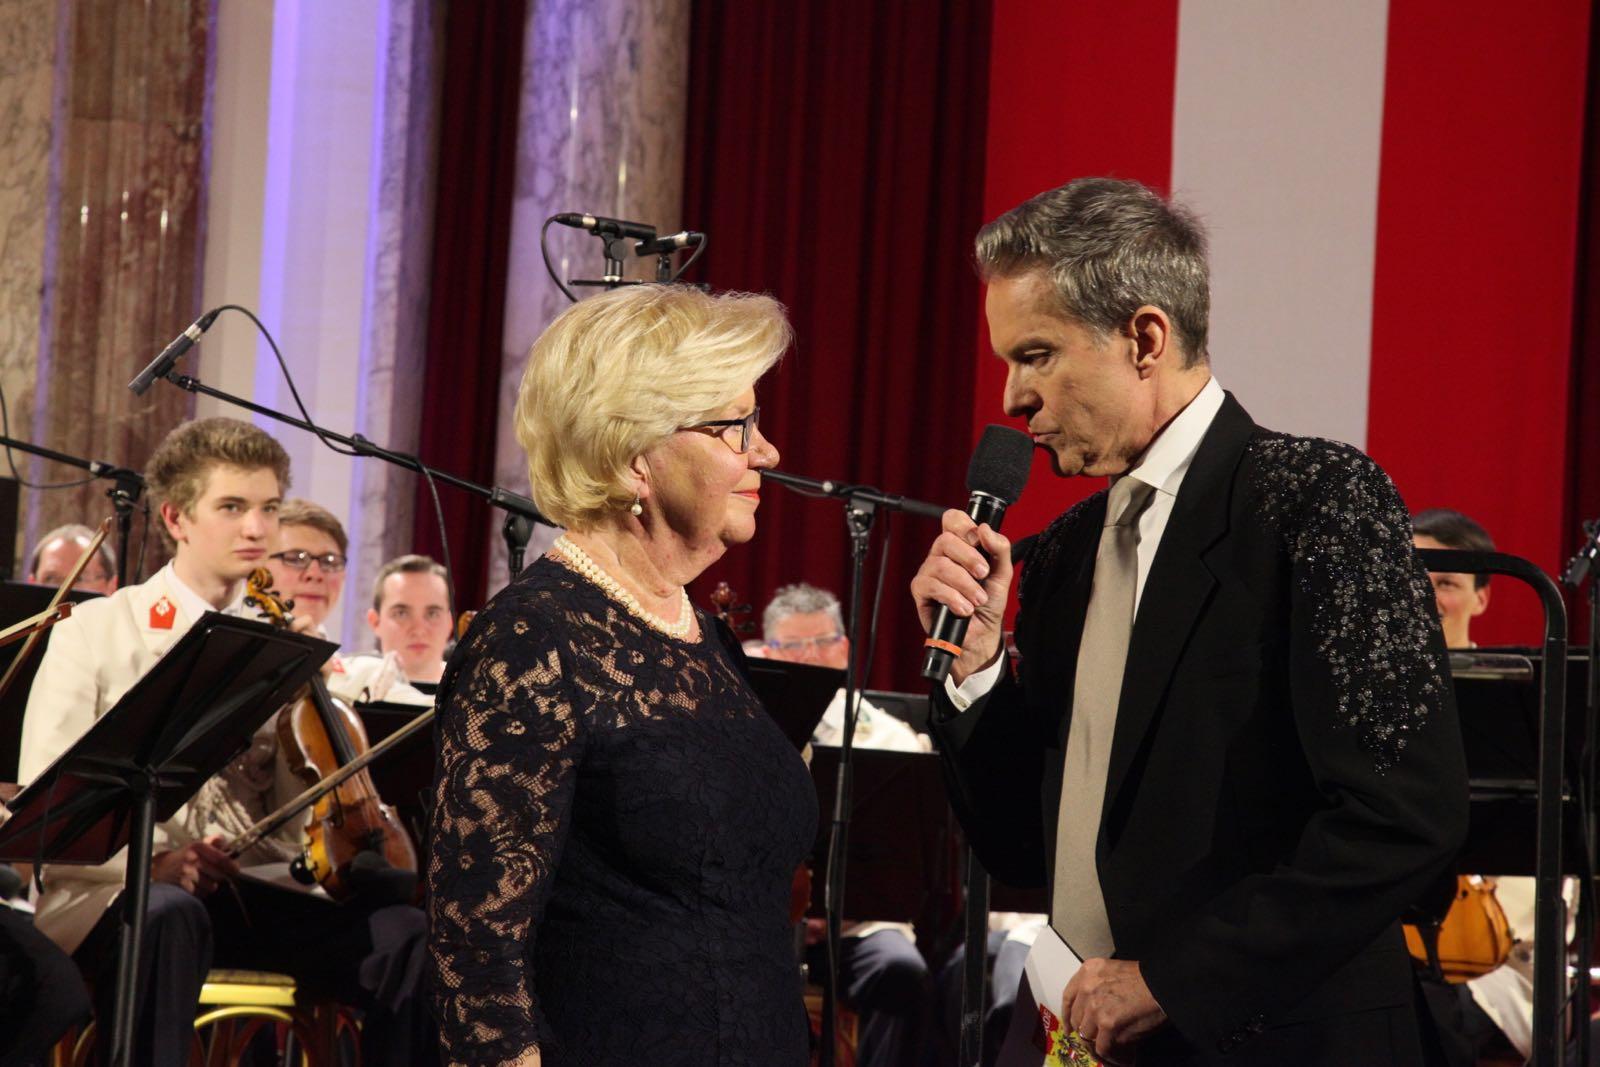 2019_03_14Gardemusik_Frühjahrskonzert_HBP_Hofburg - 68 of 177